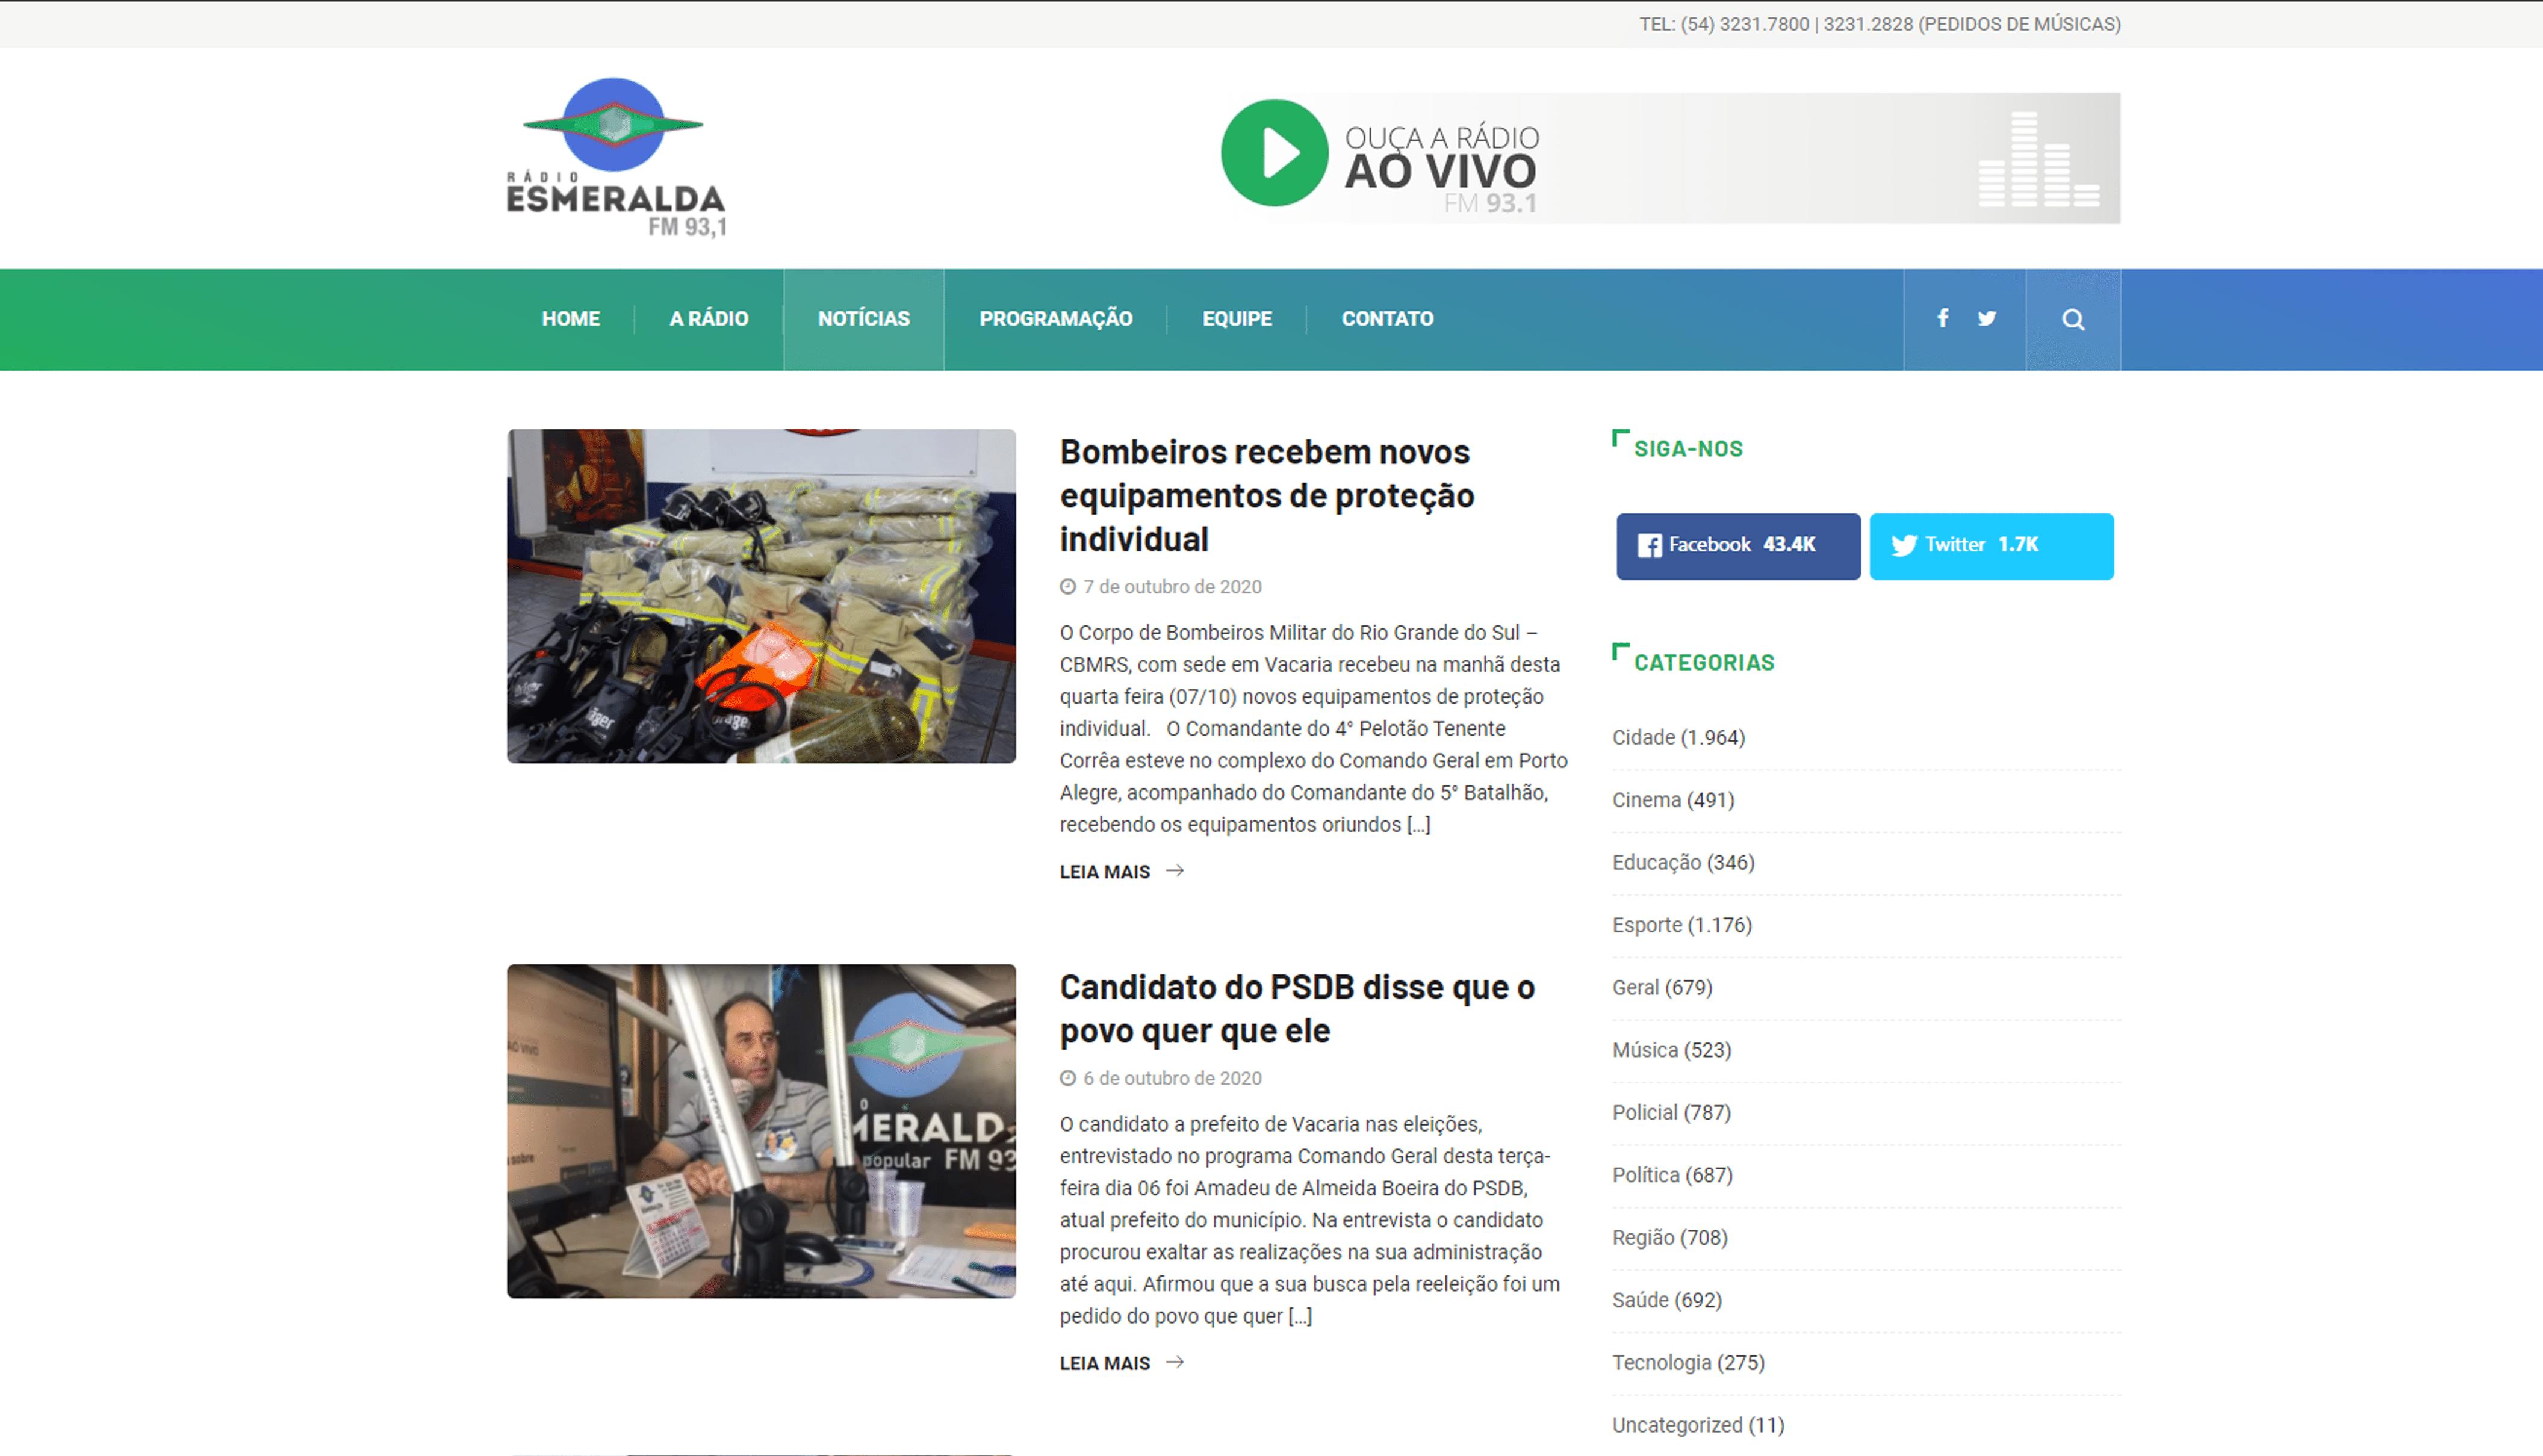 https://www.6i.com.br/case/radio-esmeralda-2/